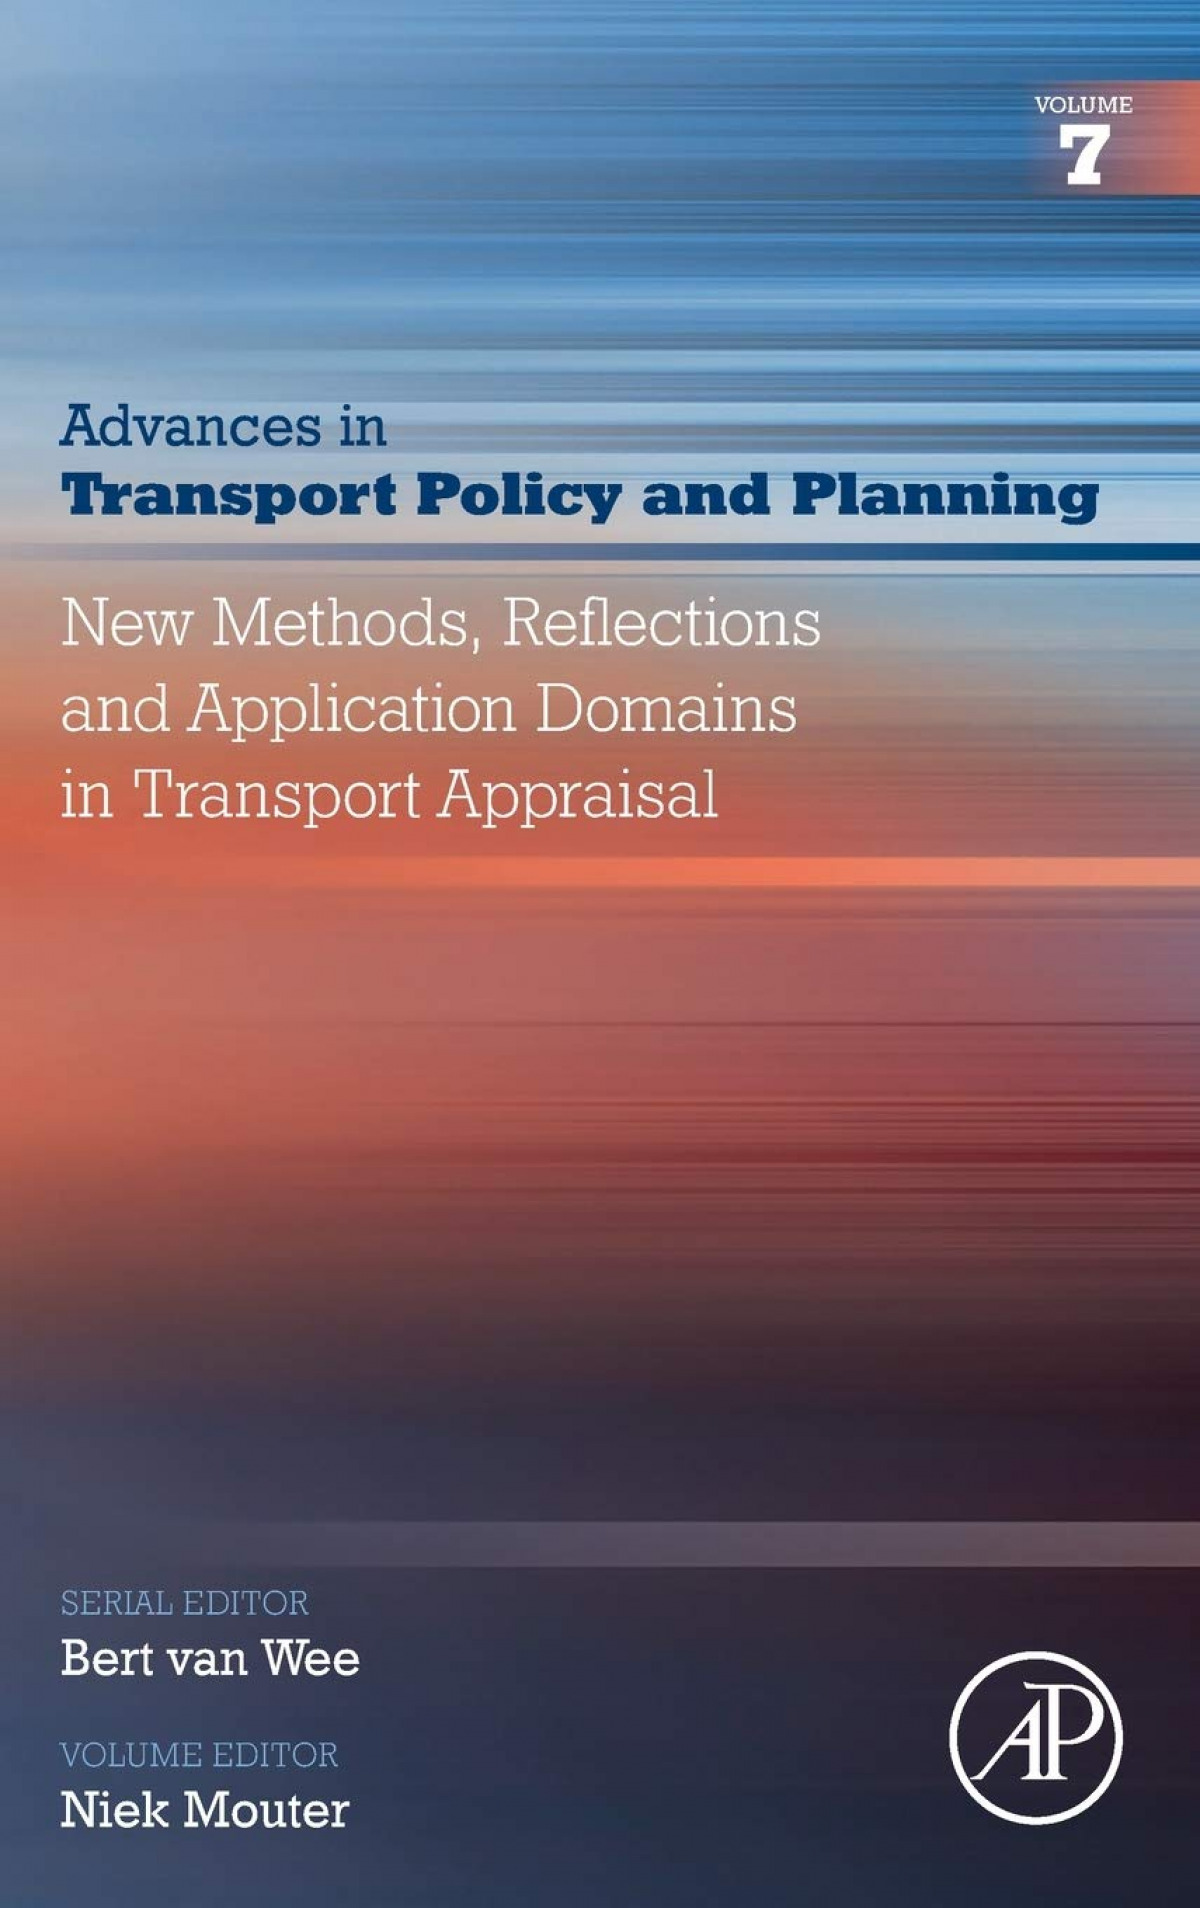 NEW METHODS REFLETIONS APPLICATION DOMAINS TRANSPORT VOL.7